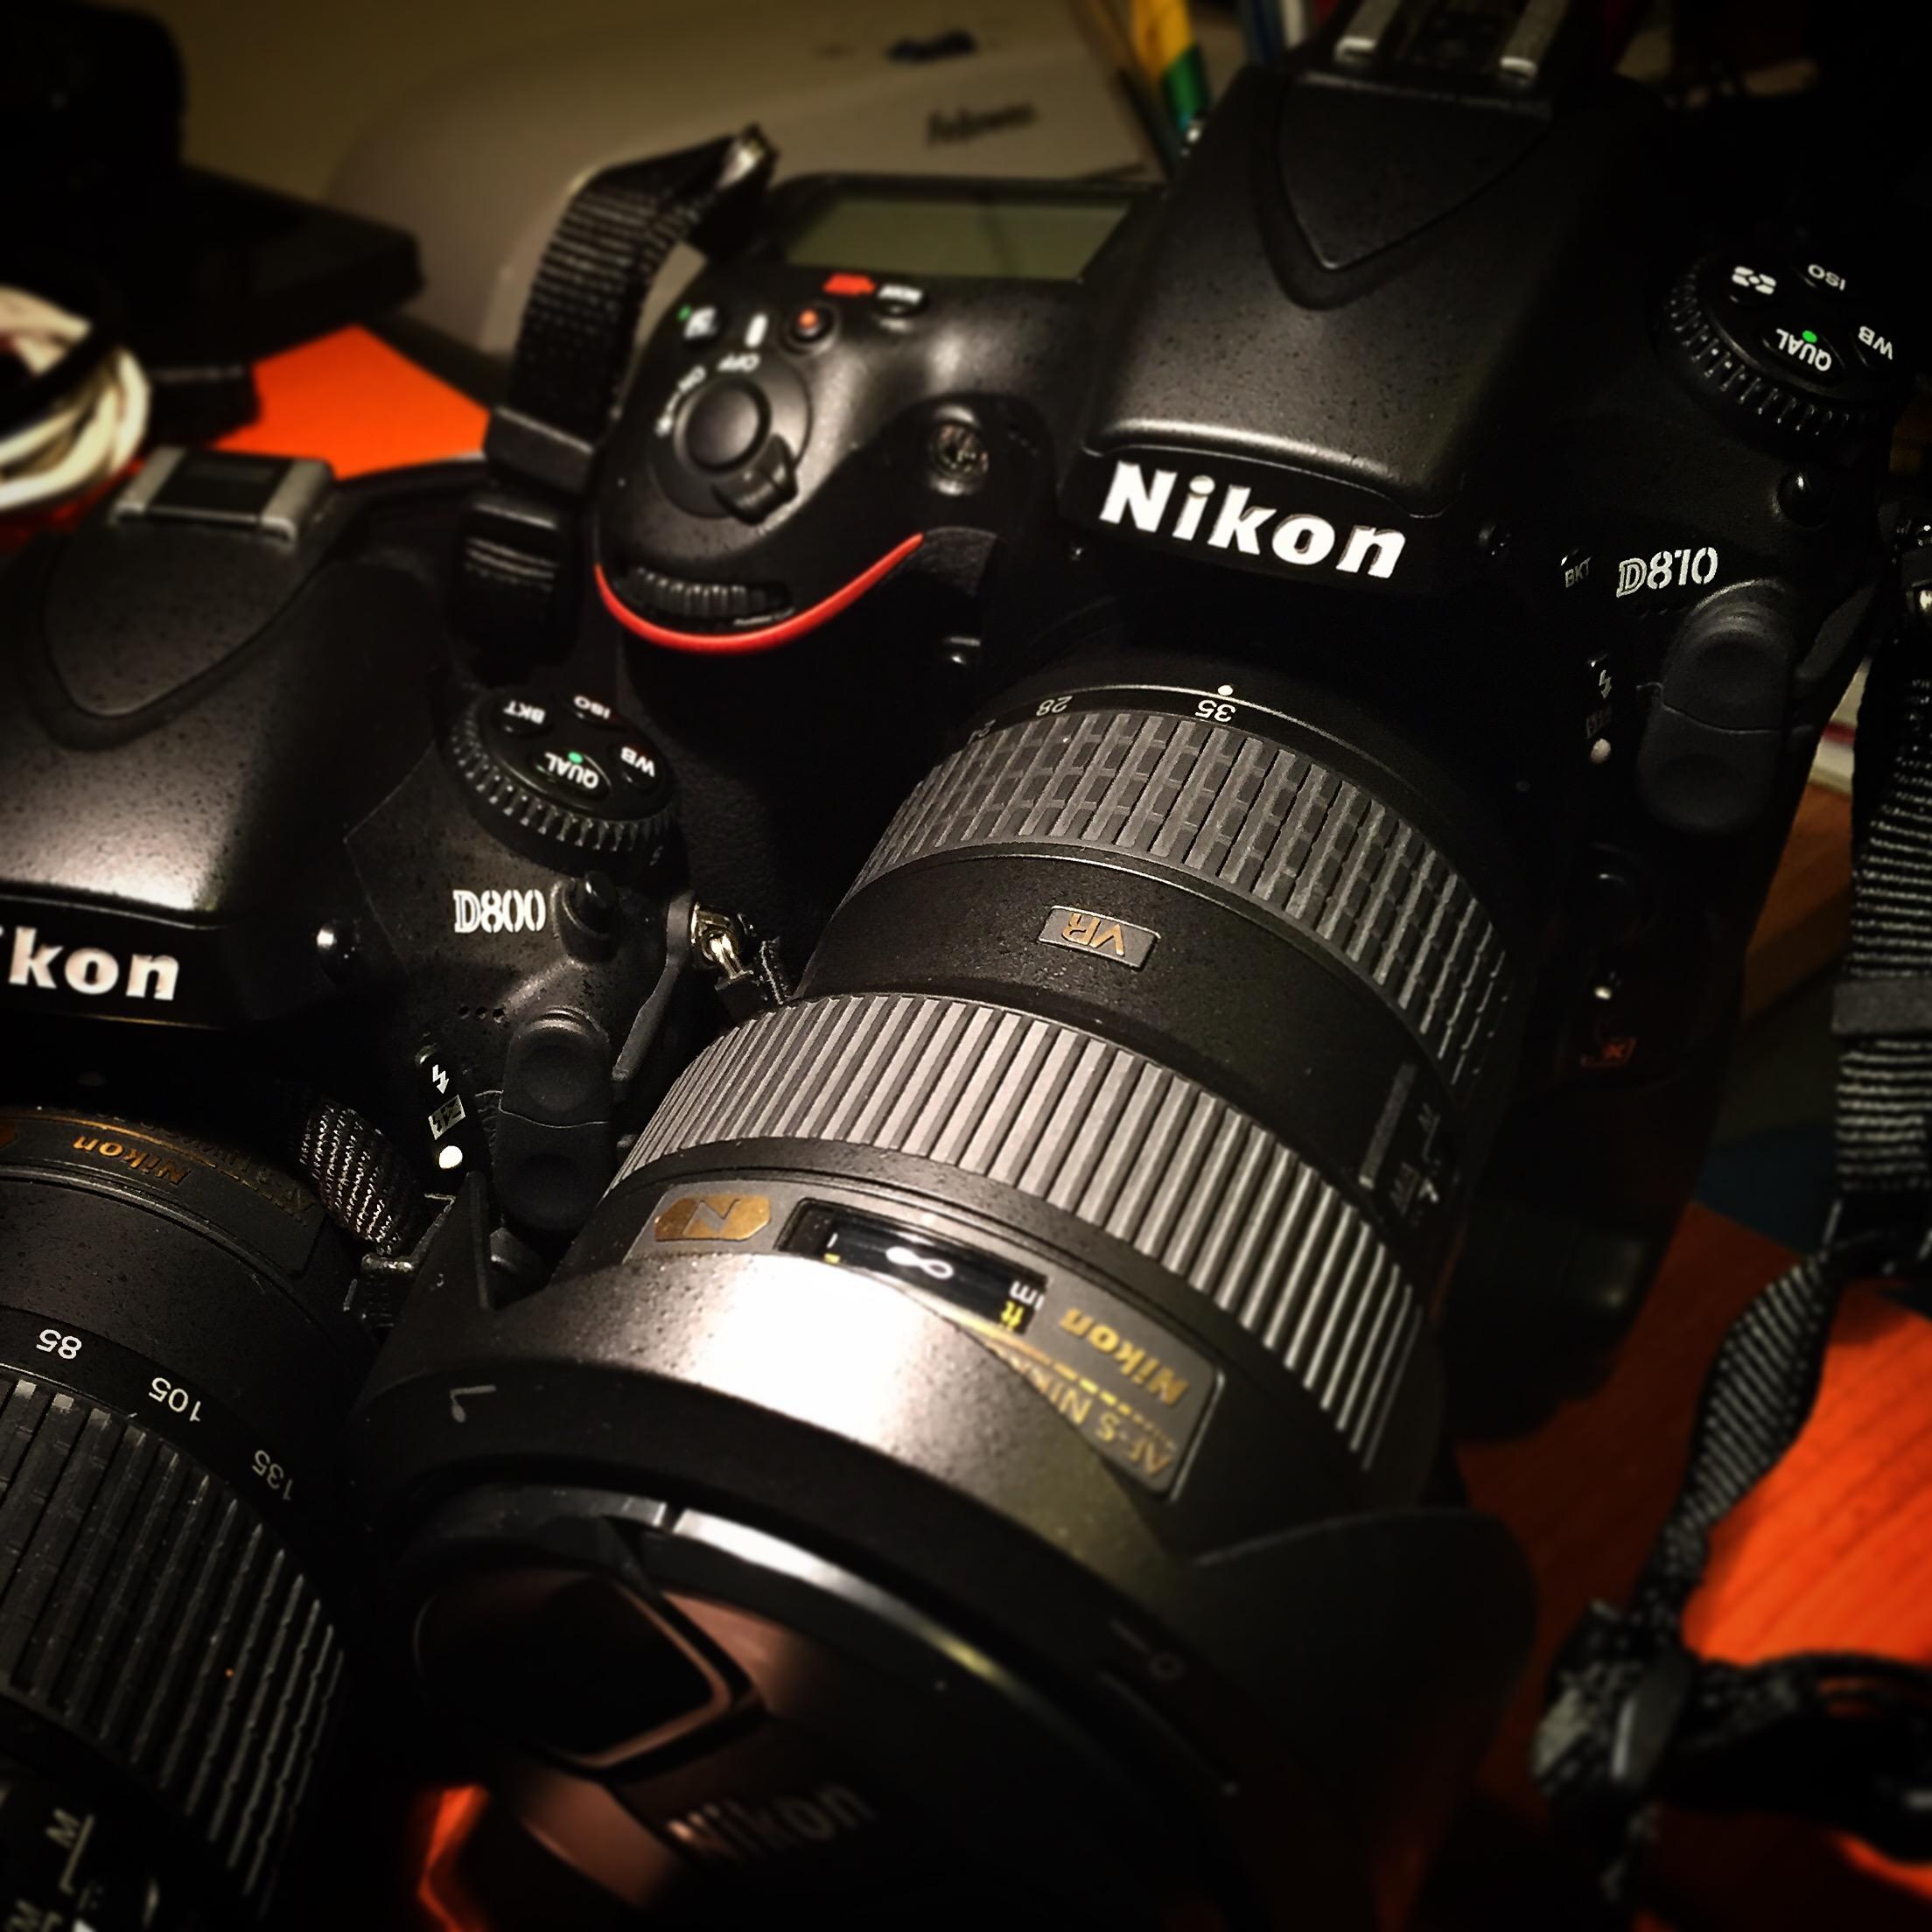 Attrezzatura : My two Nikon Camera D800 bodies